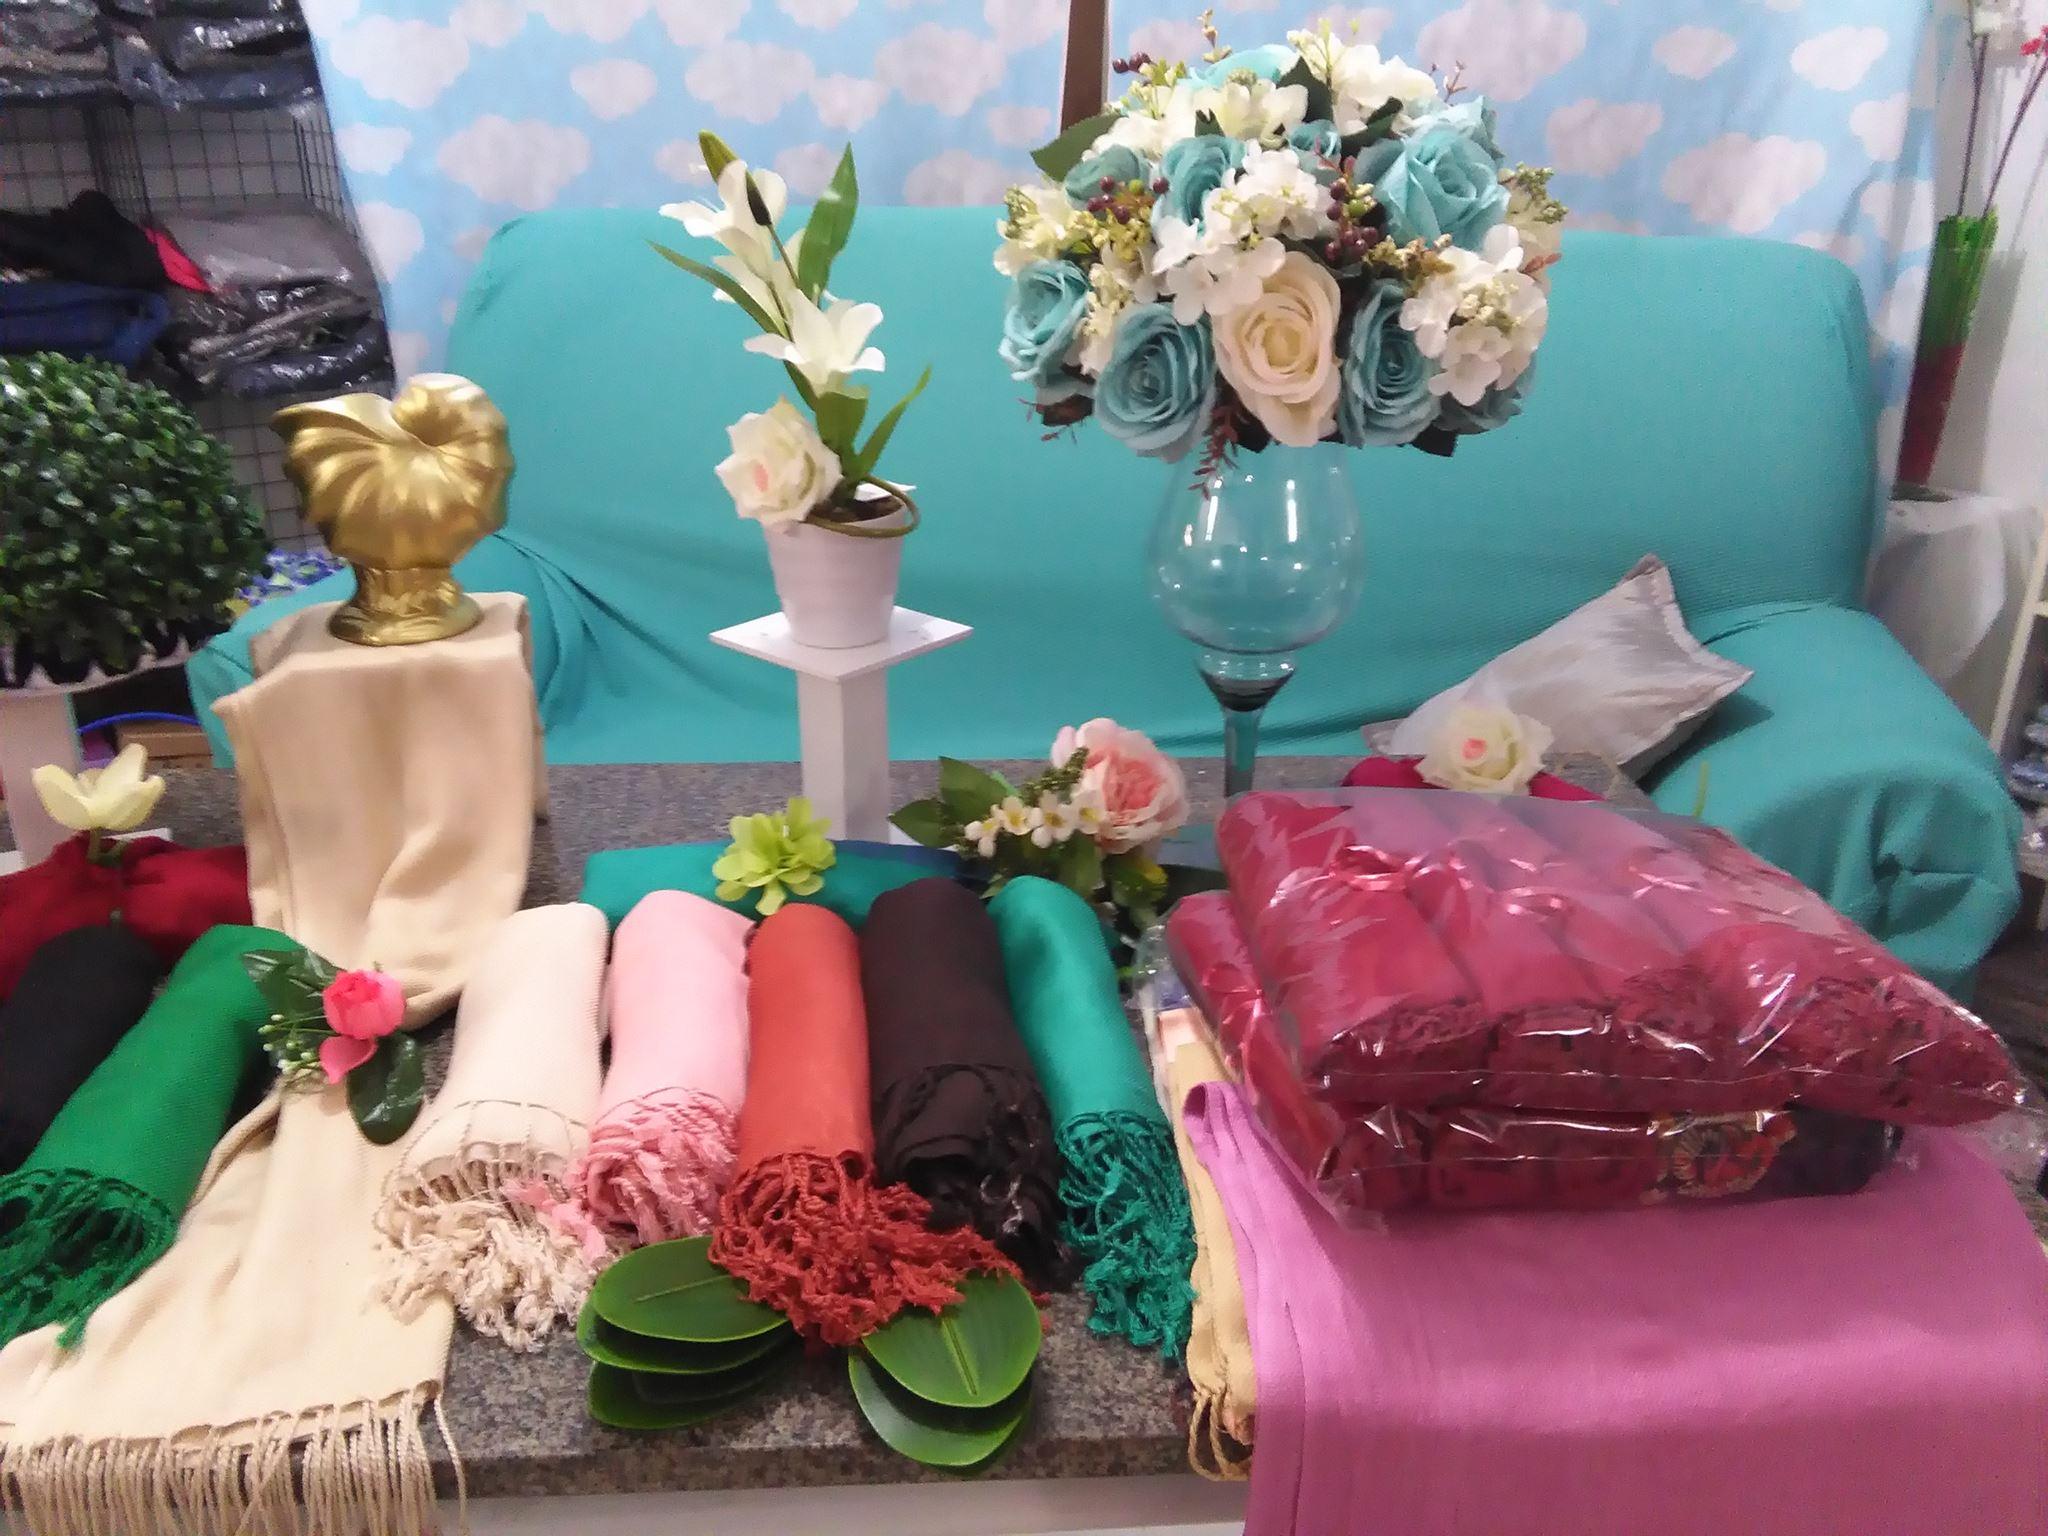 Ate 60% de Desconto - Atacado especial para noivas e brindes para eventos